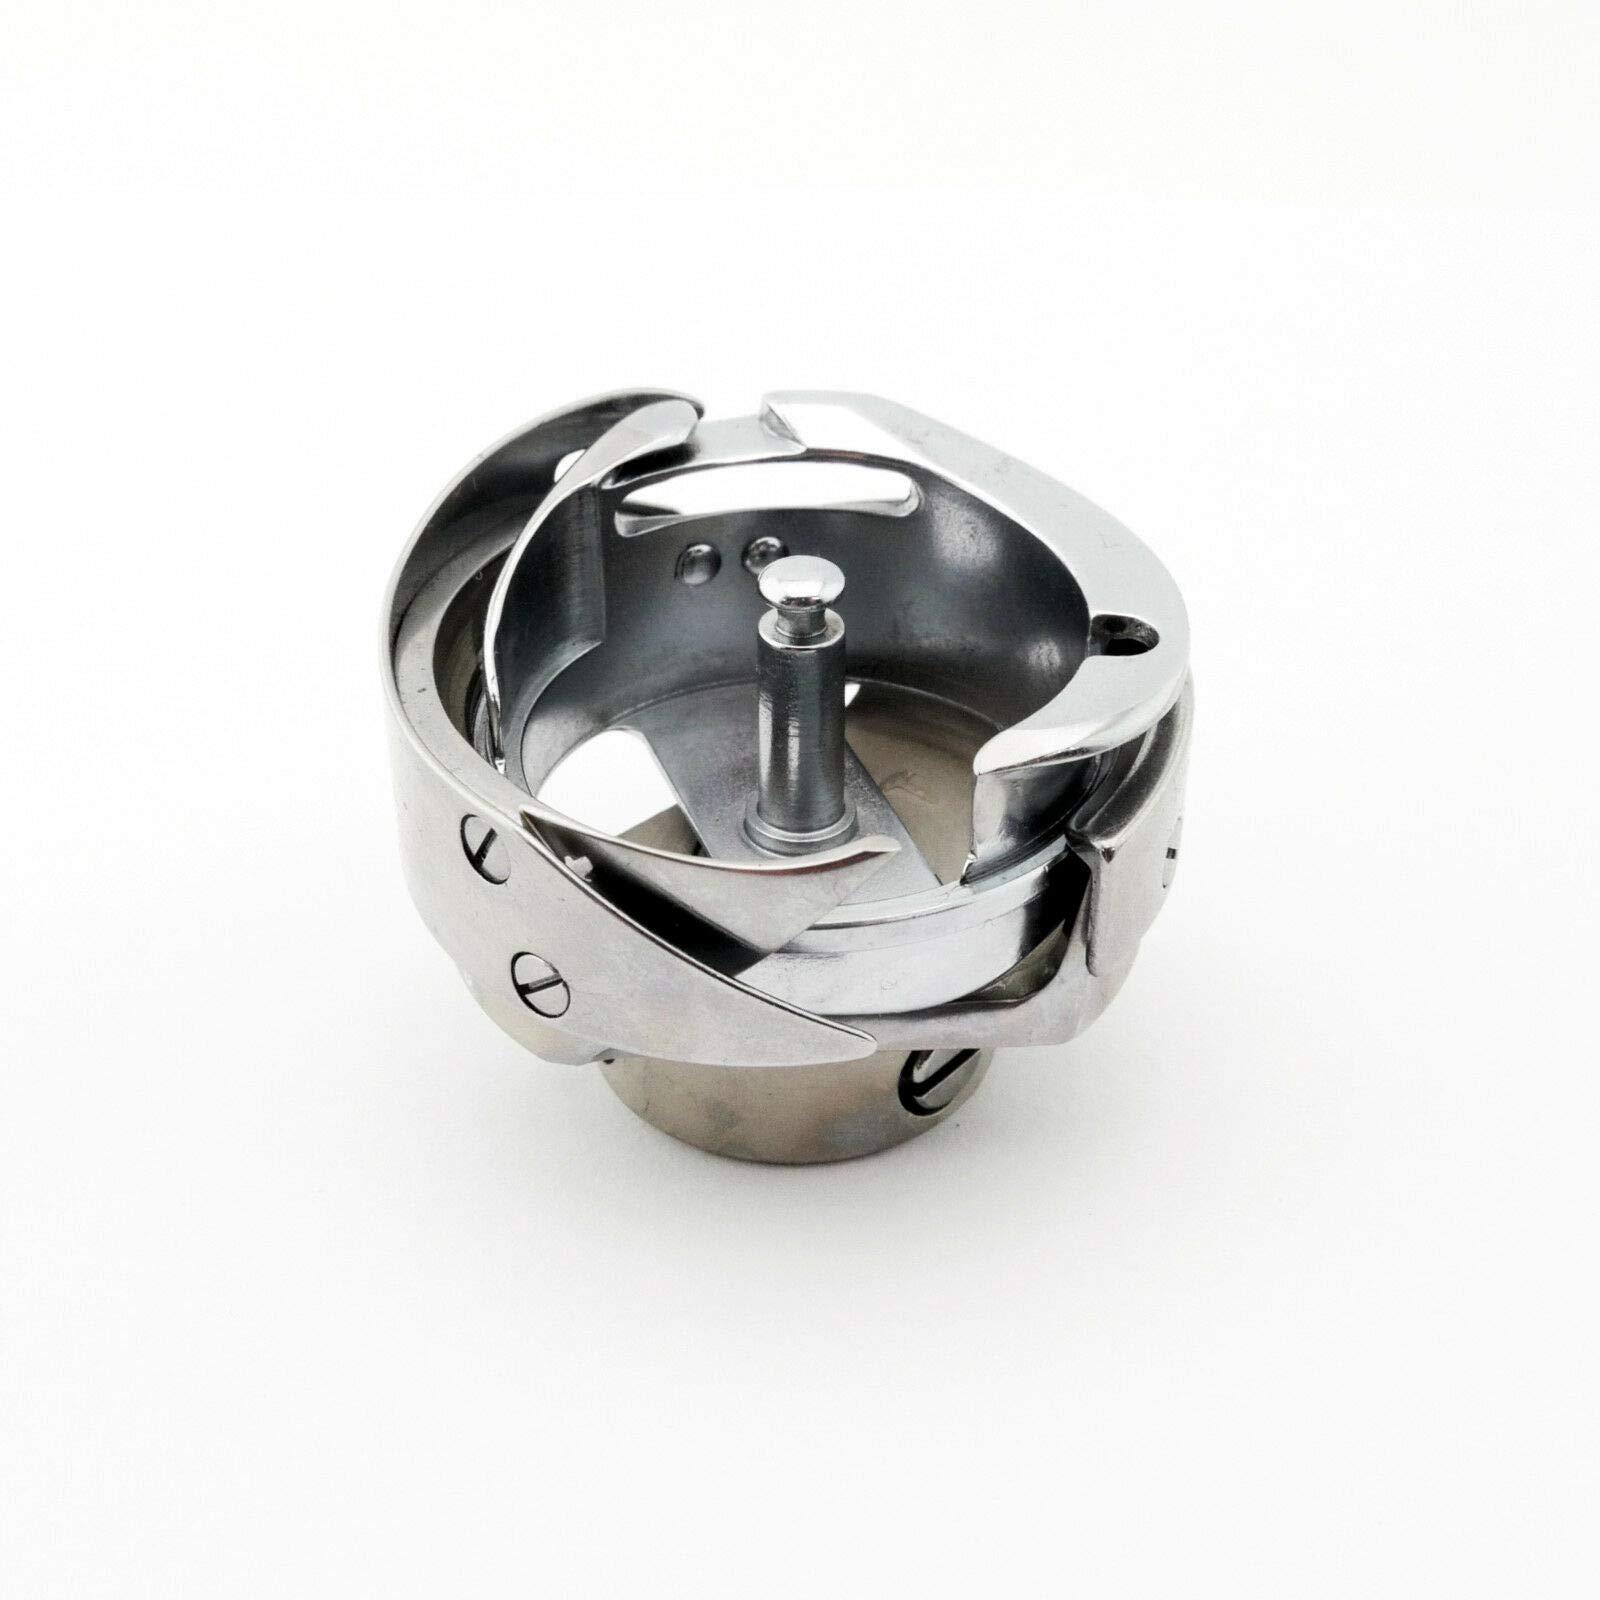 Rotary Hook #10017 for Artisan 611-AB, 618, 797AB / Chandler 337 / Seiko H-2BL